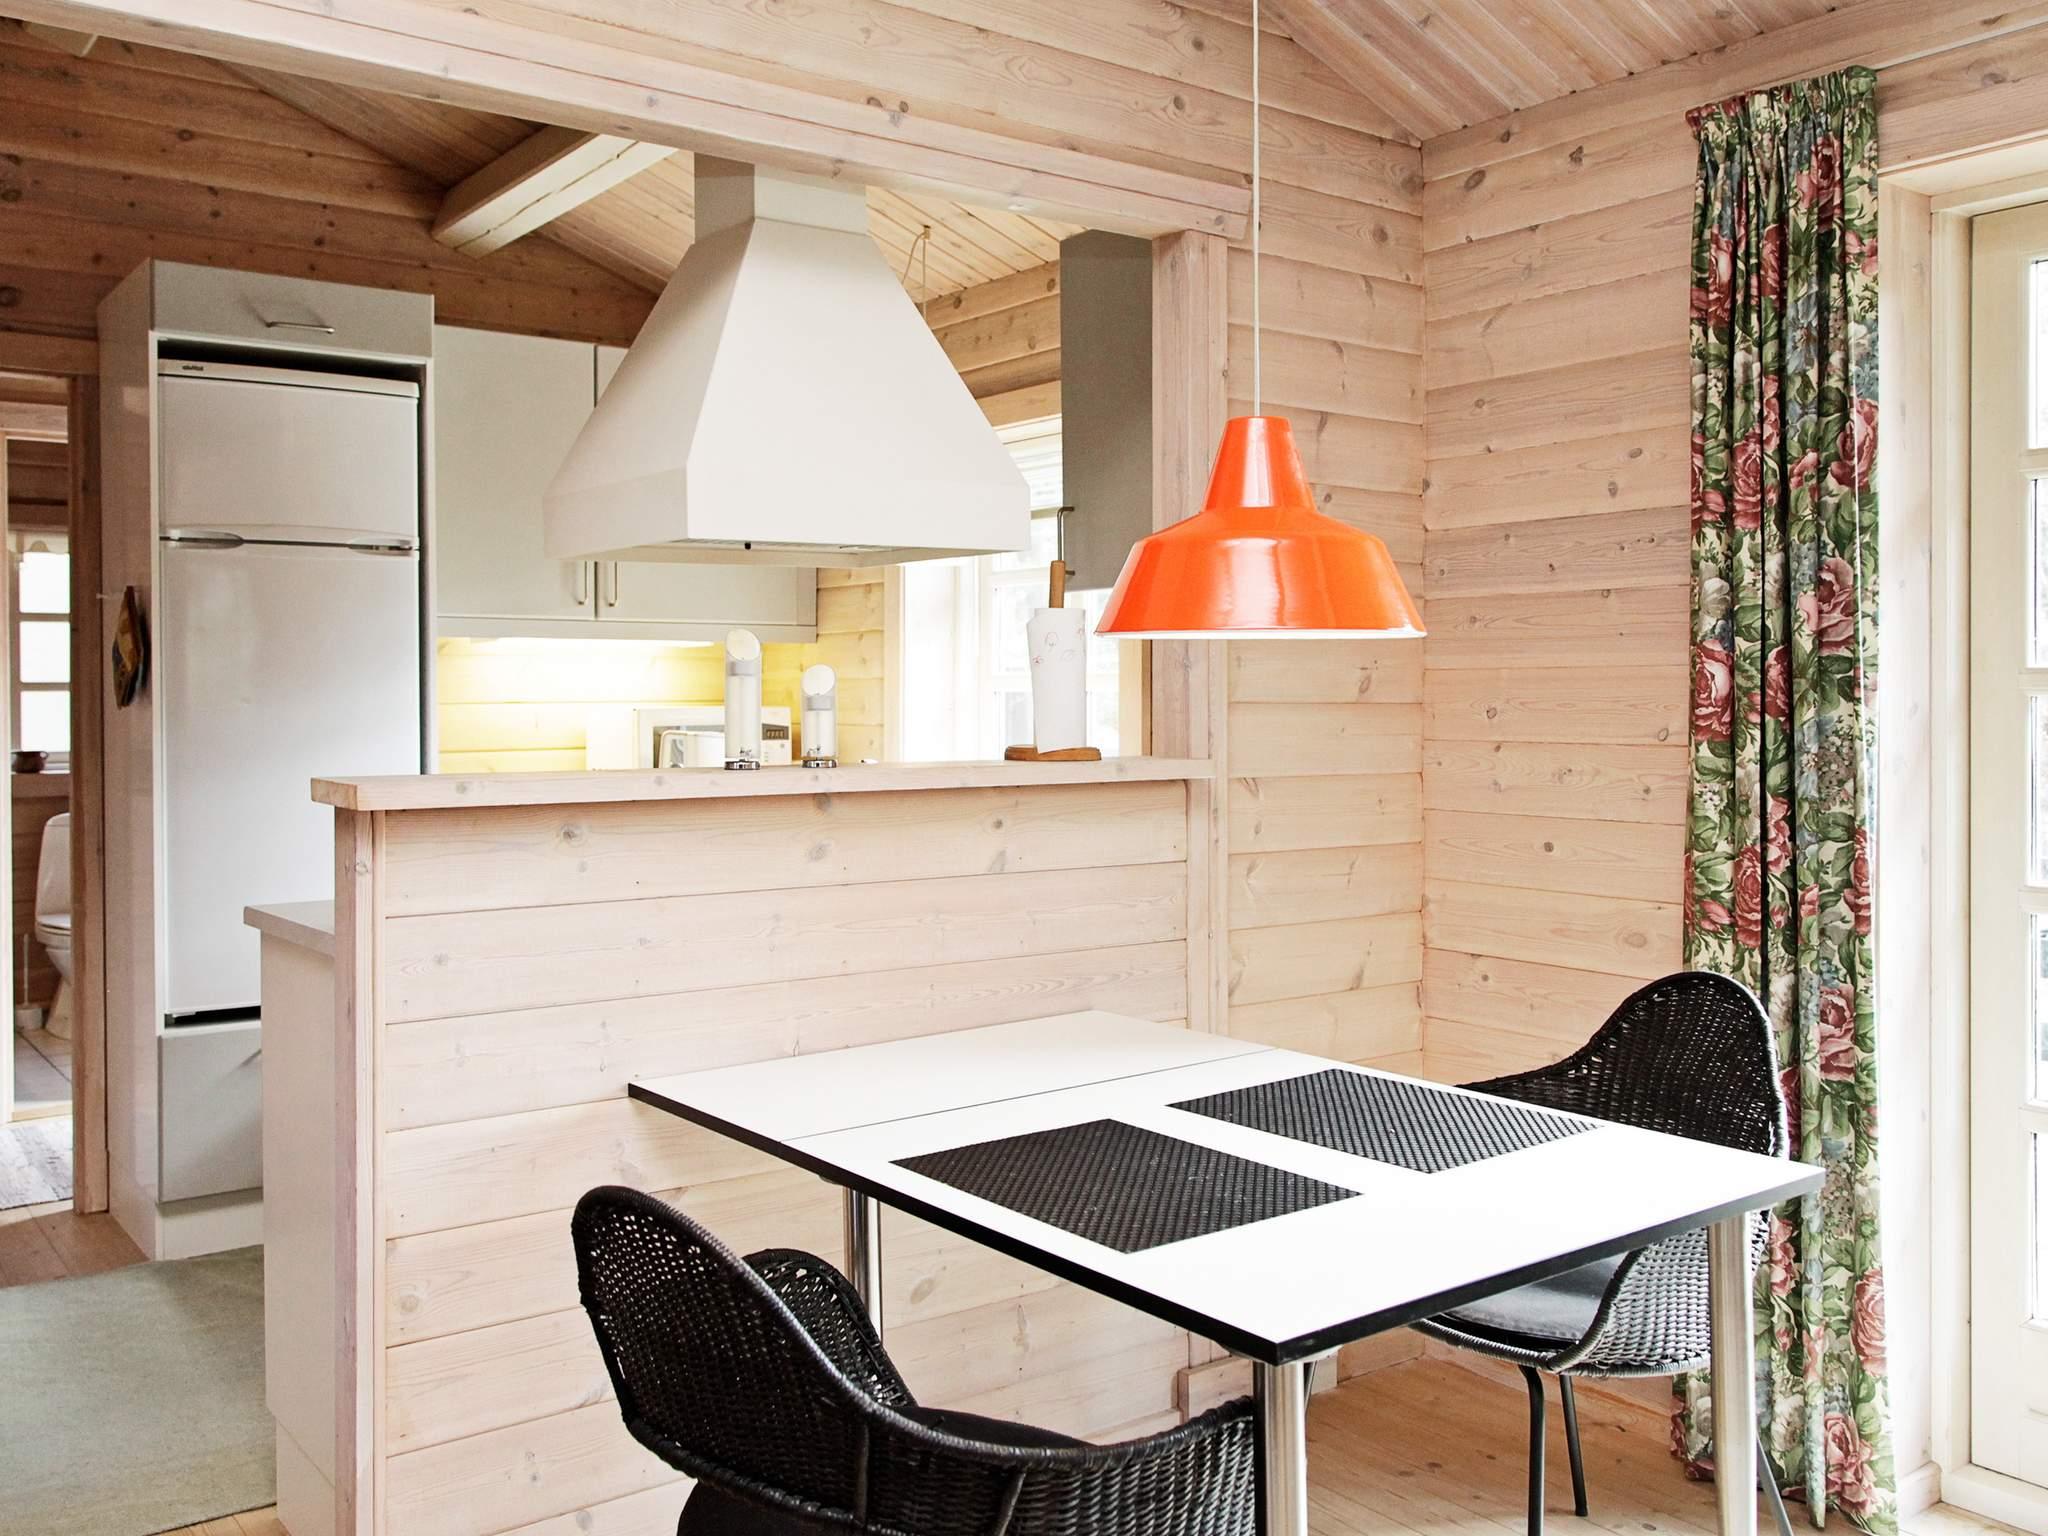 Ferienhaus Fjellerup Strand (84412), Fjellerup, , Ostjütland, Dänemark, Bild 5